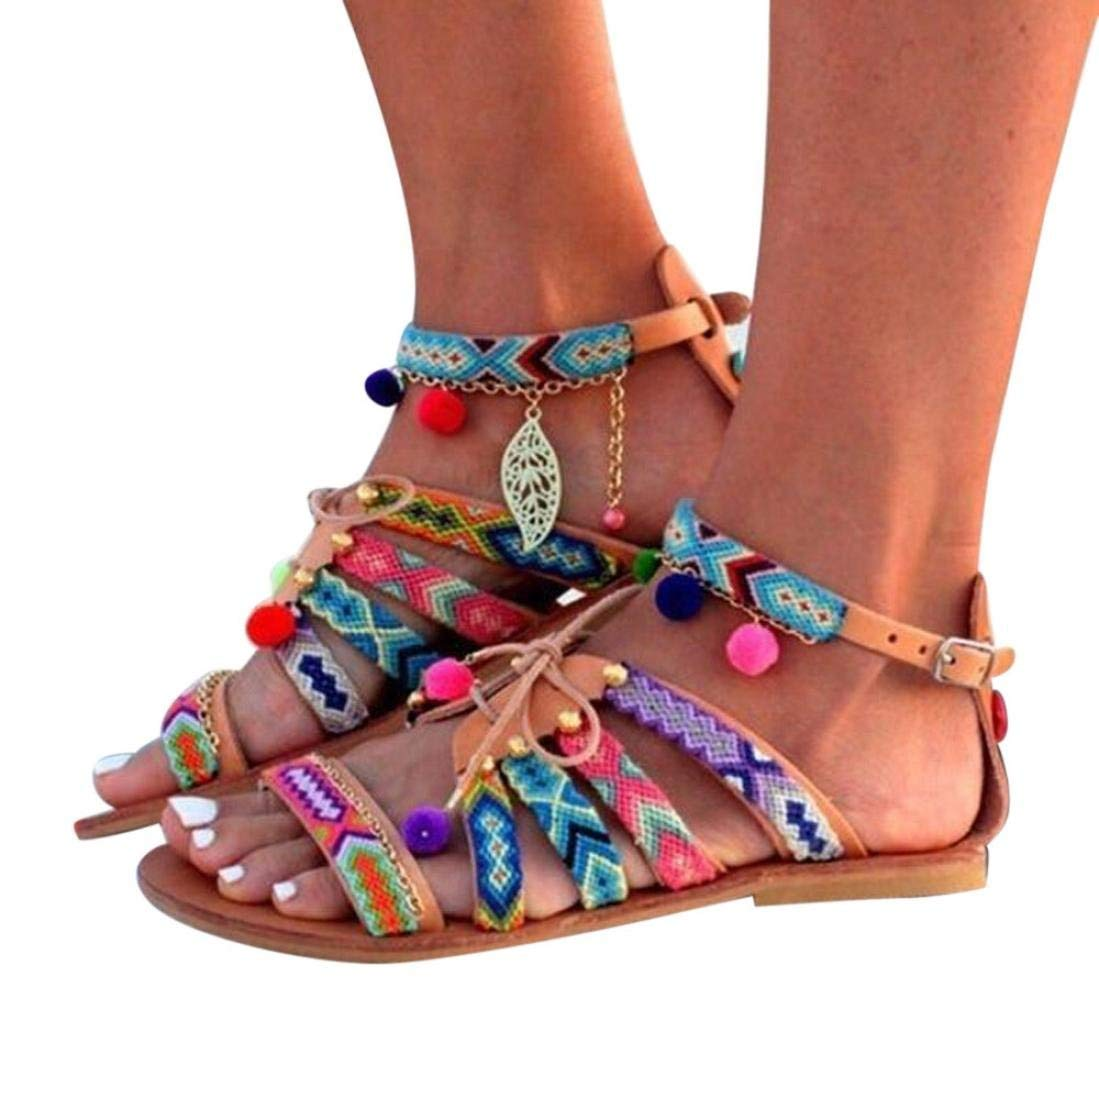 Sandals,Clearance!!Duseedik Women Flat Sandals Summer Flat Shoes Ladies Flip Flops Bohemia Sandals Leather Sandals Flats Shoes Pom-Pom Sandals Beach Sandals for Women (Multicolor, US:7(CN:39))